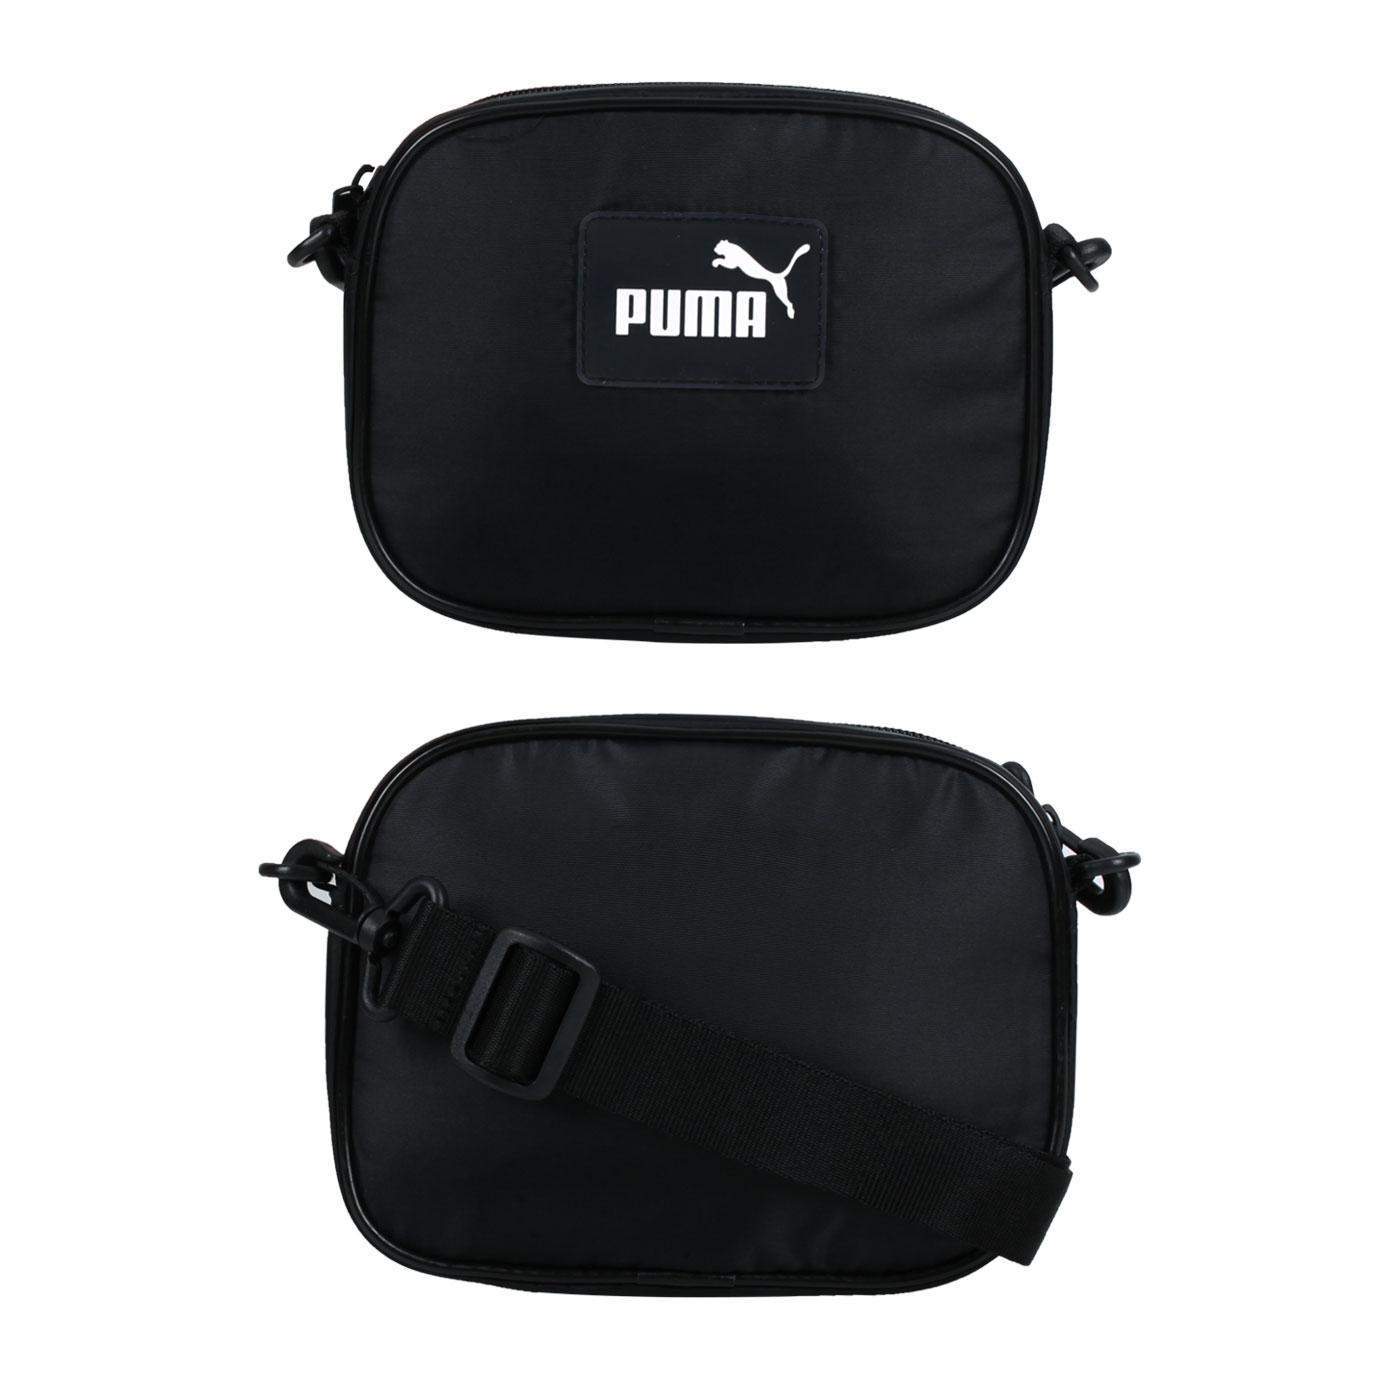 PUMA 小側背包 07834601 - 黑白